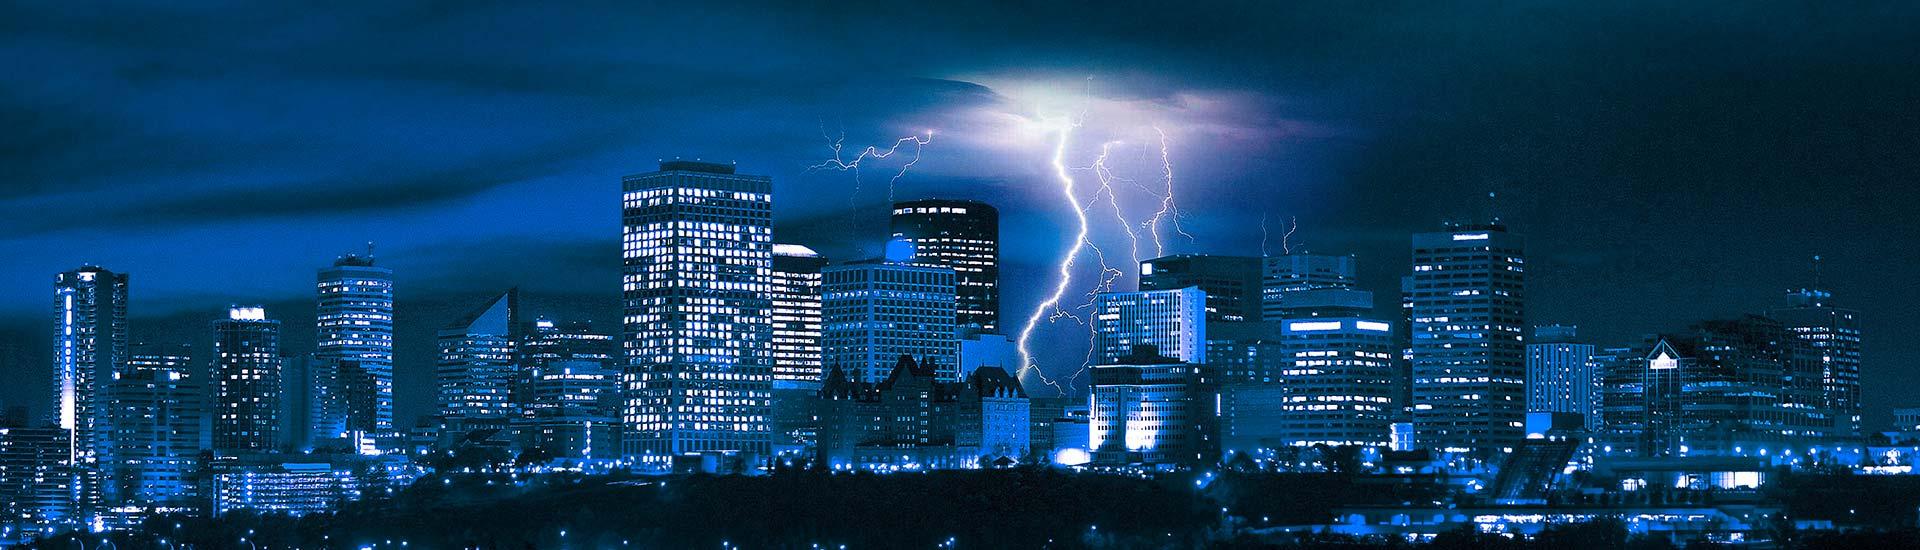 Edmonton Skyline   Lightning IT Services   Alberta's Top Choice for IT Services